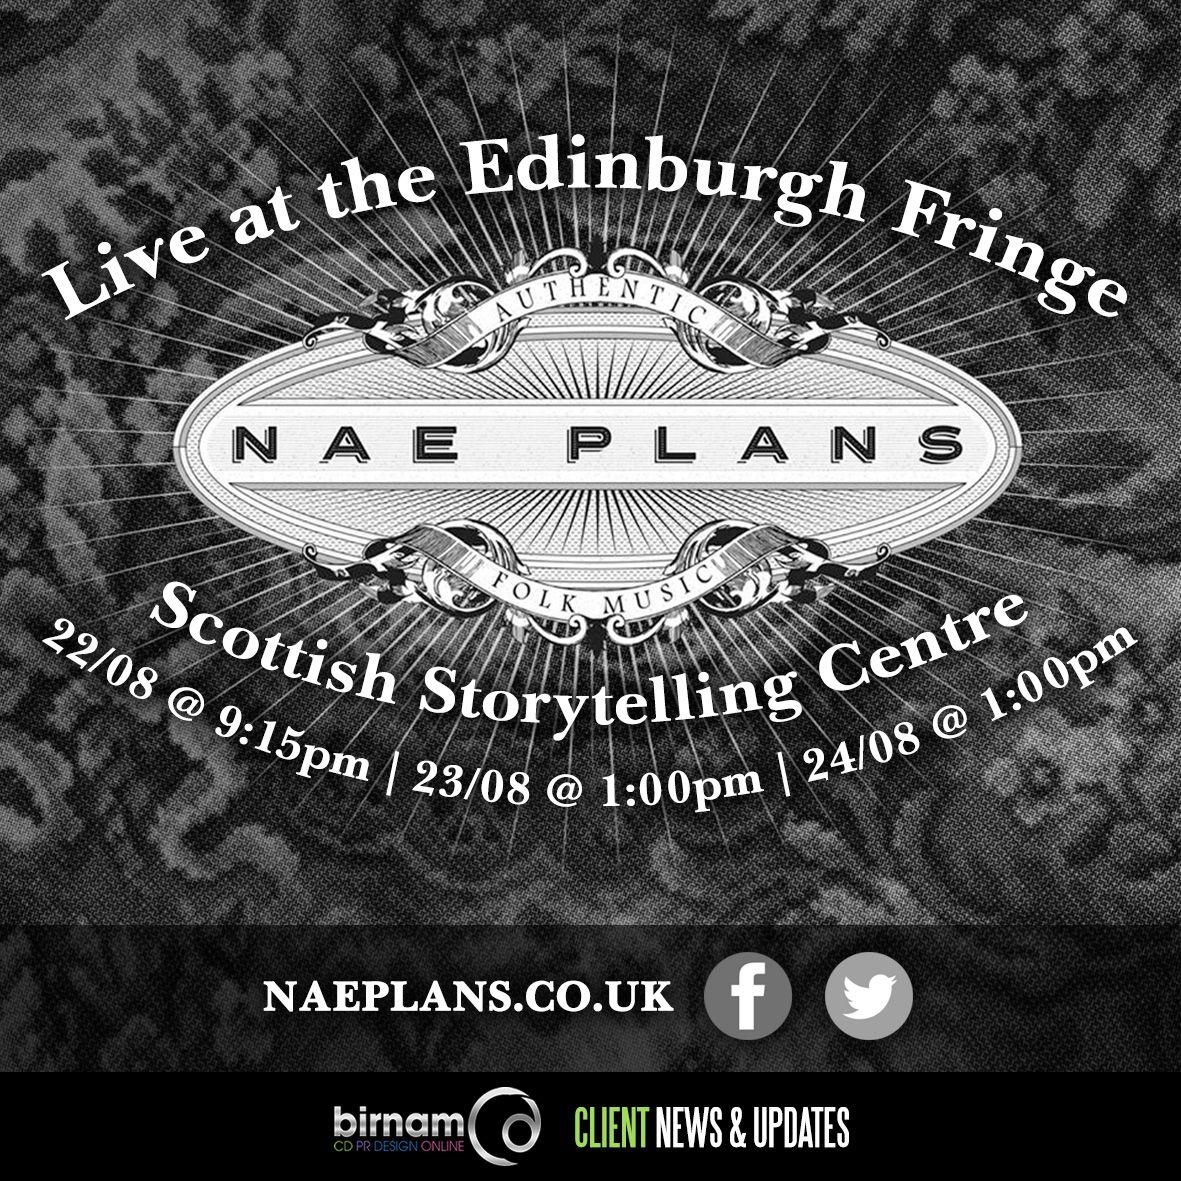 Catch Nae Plans at the Edinburgh Festival Fringe this August.   www.edfringe.com | www.naeplans.co.uk